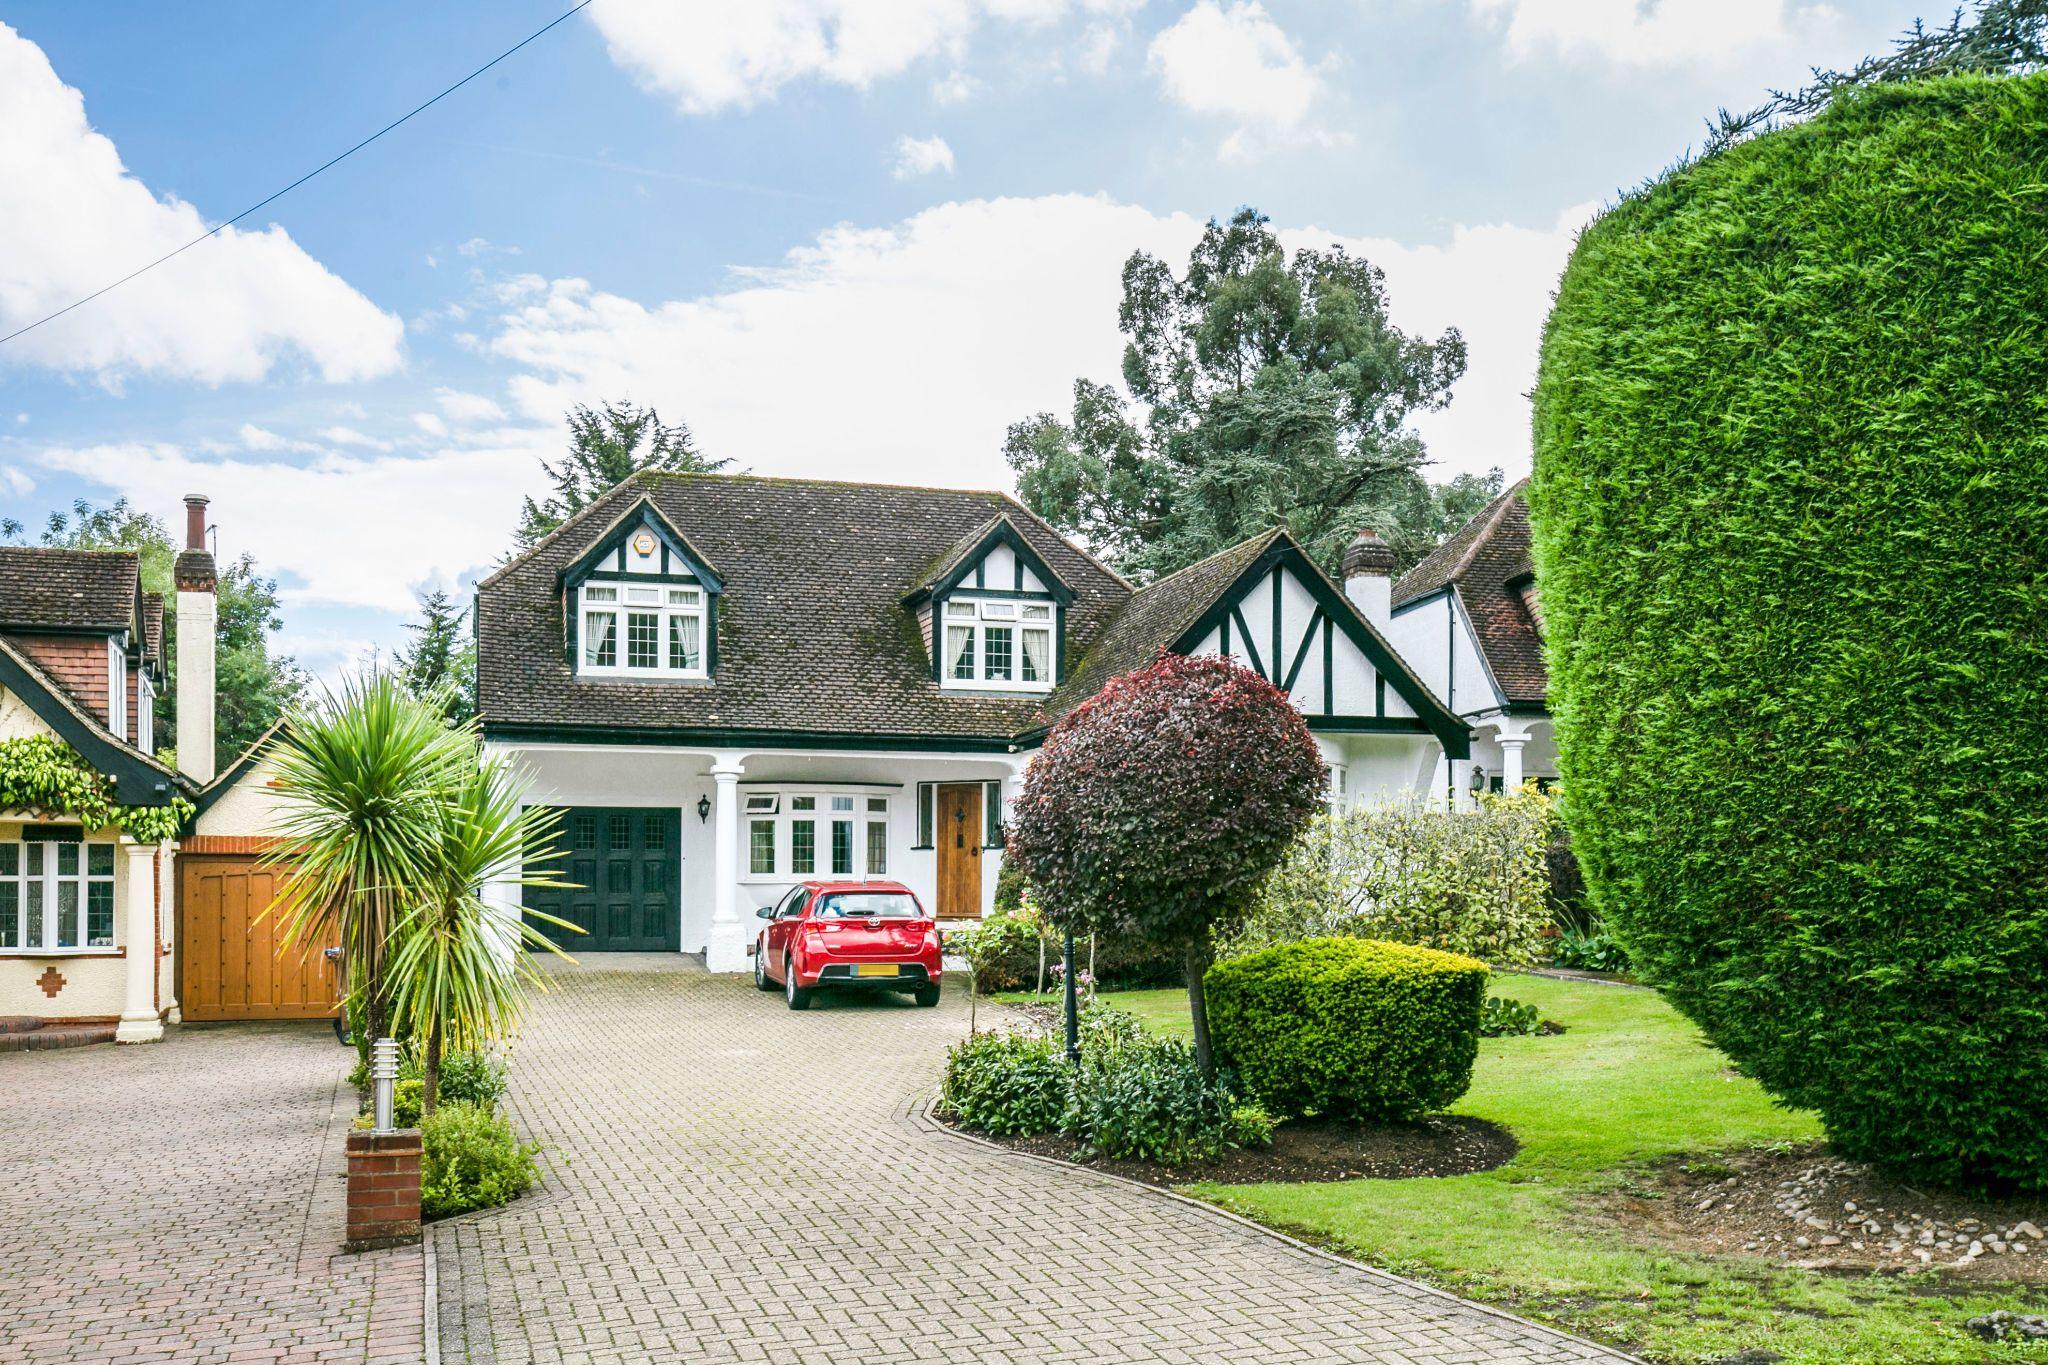 4 bedroom detached house For Sale in Brookmans Park - Photograph 2